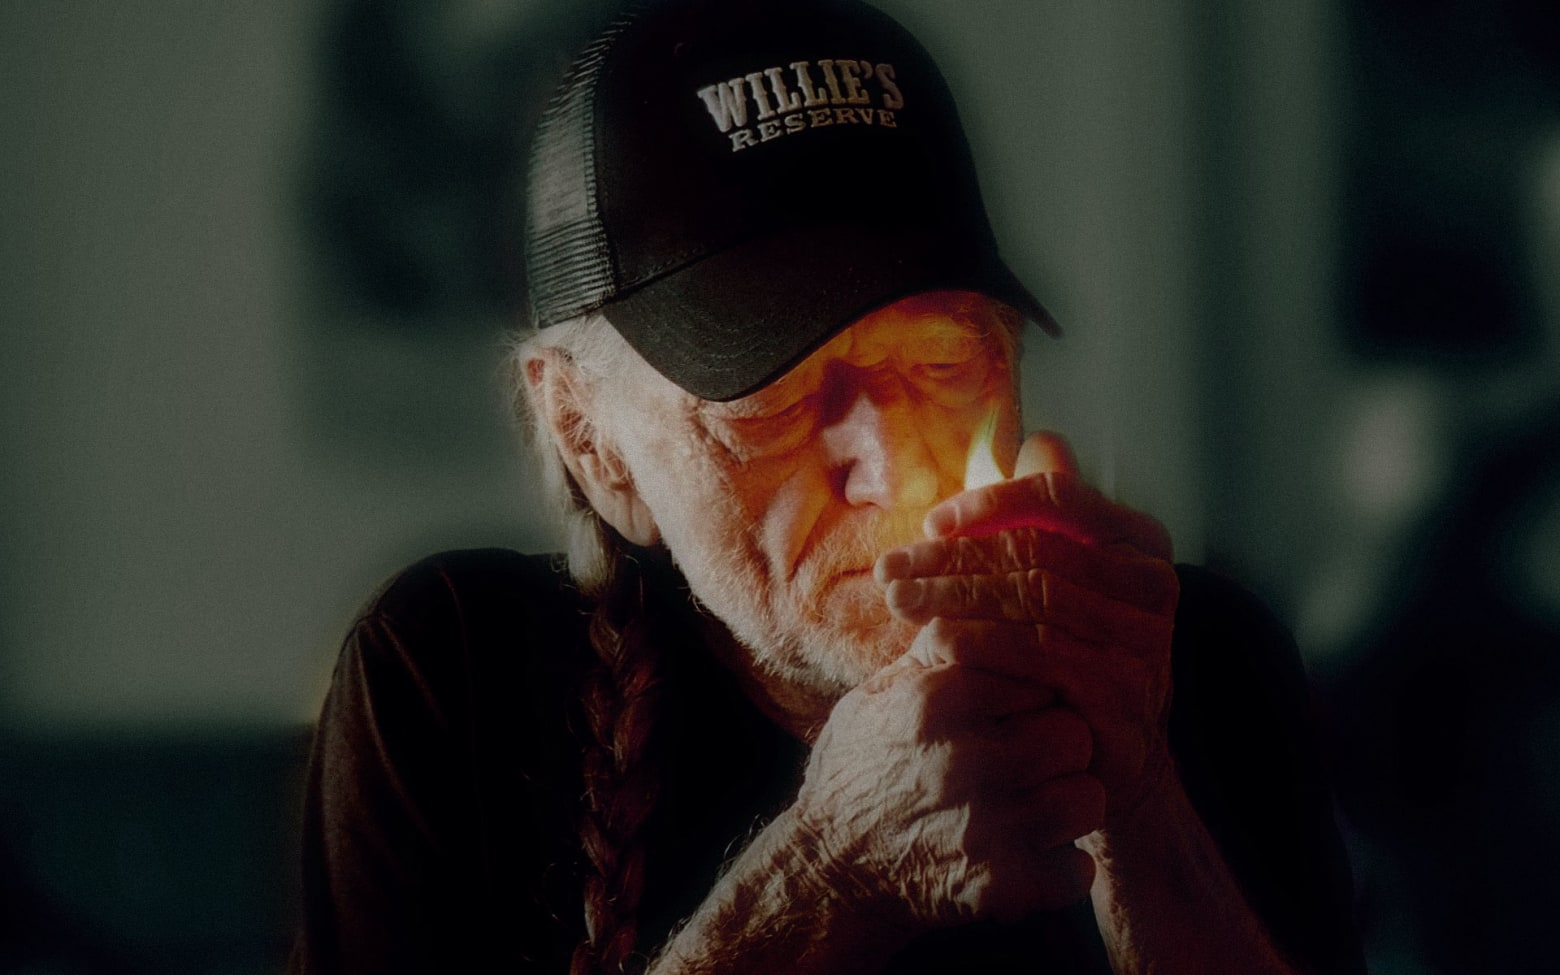 Image via Willie's Reserve